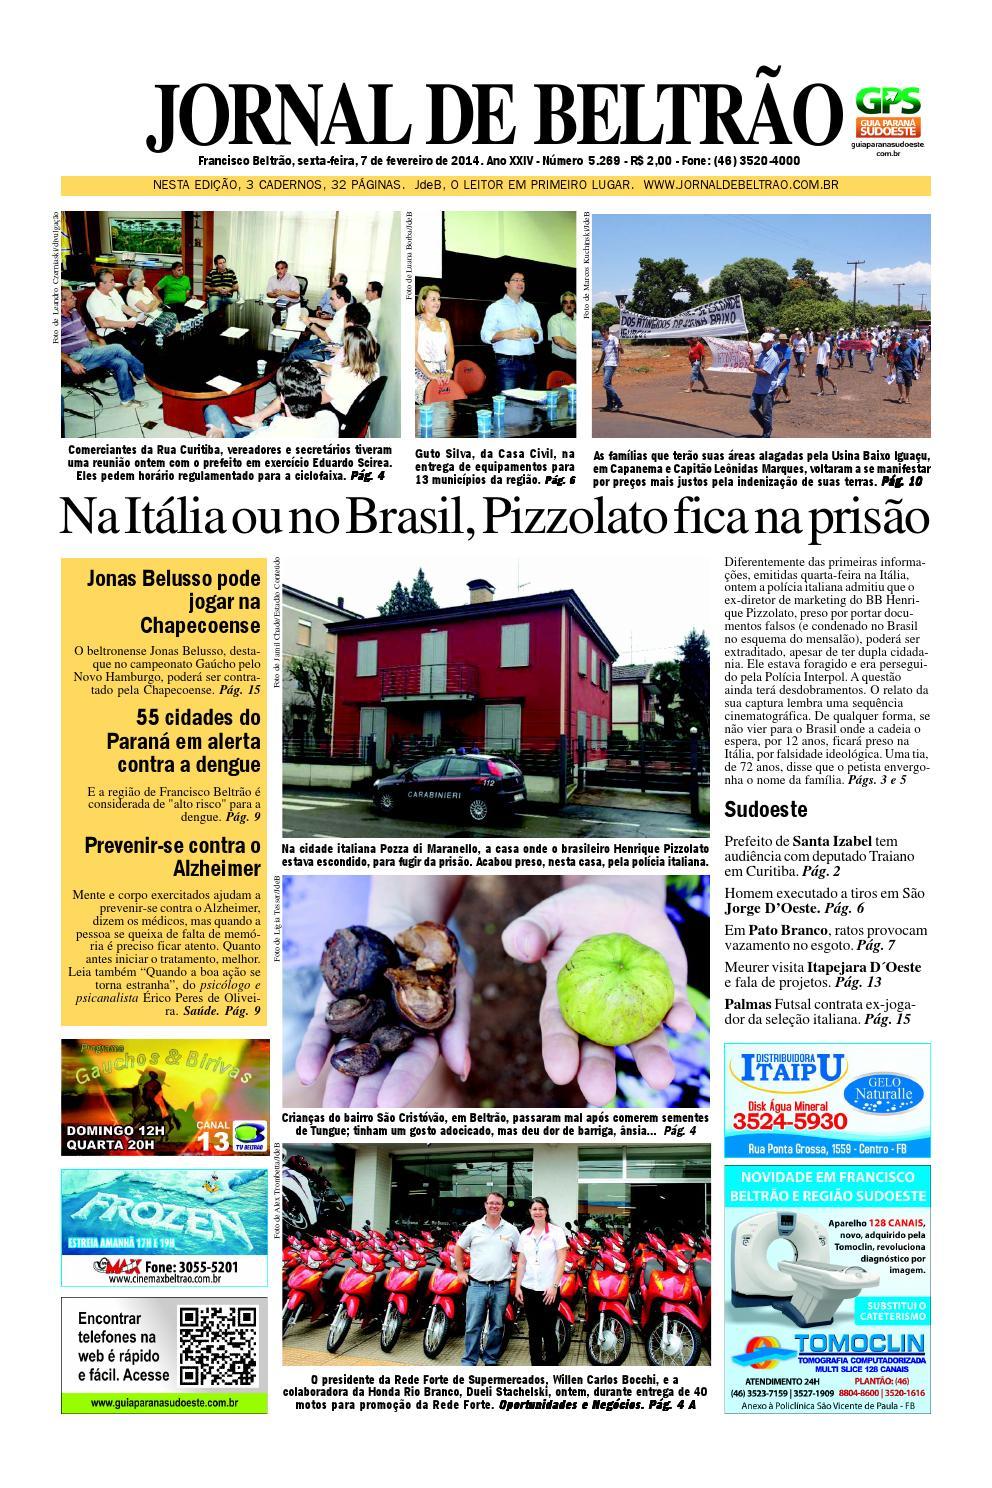 Jornaldebeltrão 5269 2014 02 07 by Orangotoe - issuu 989e08eb54612